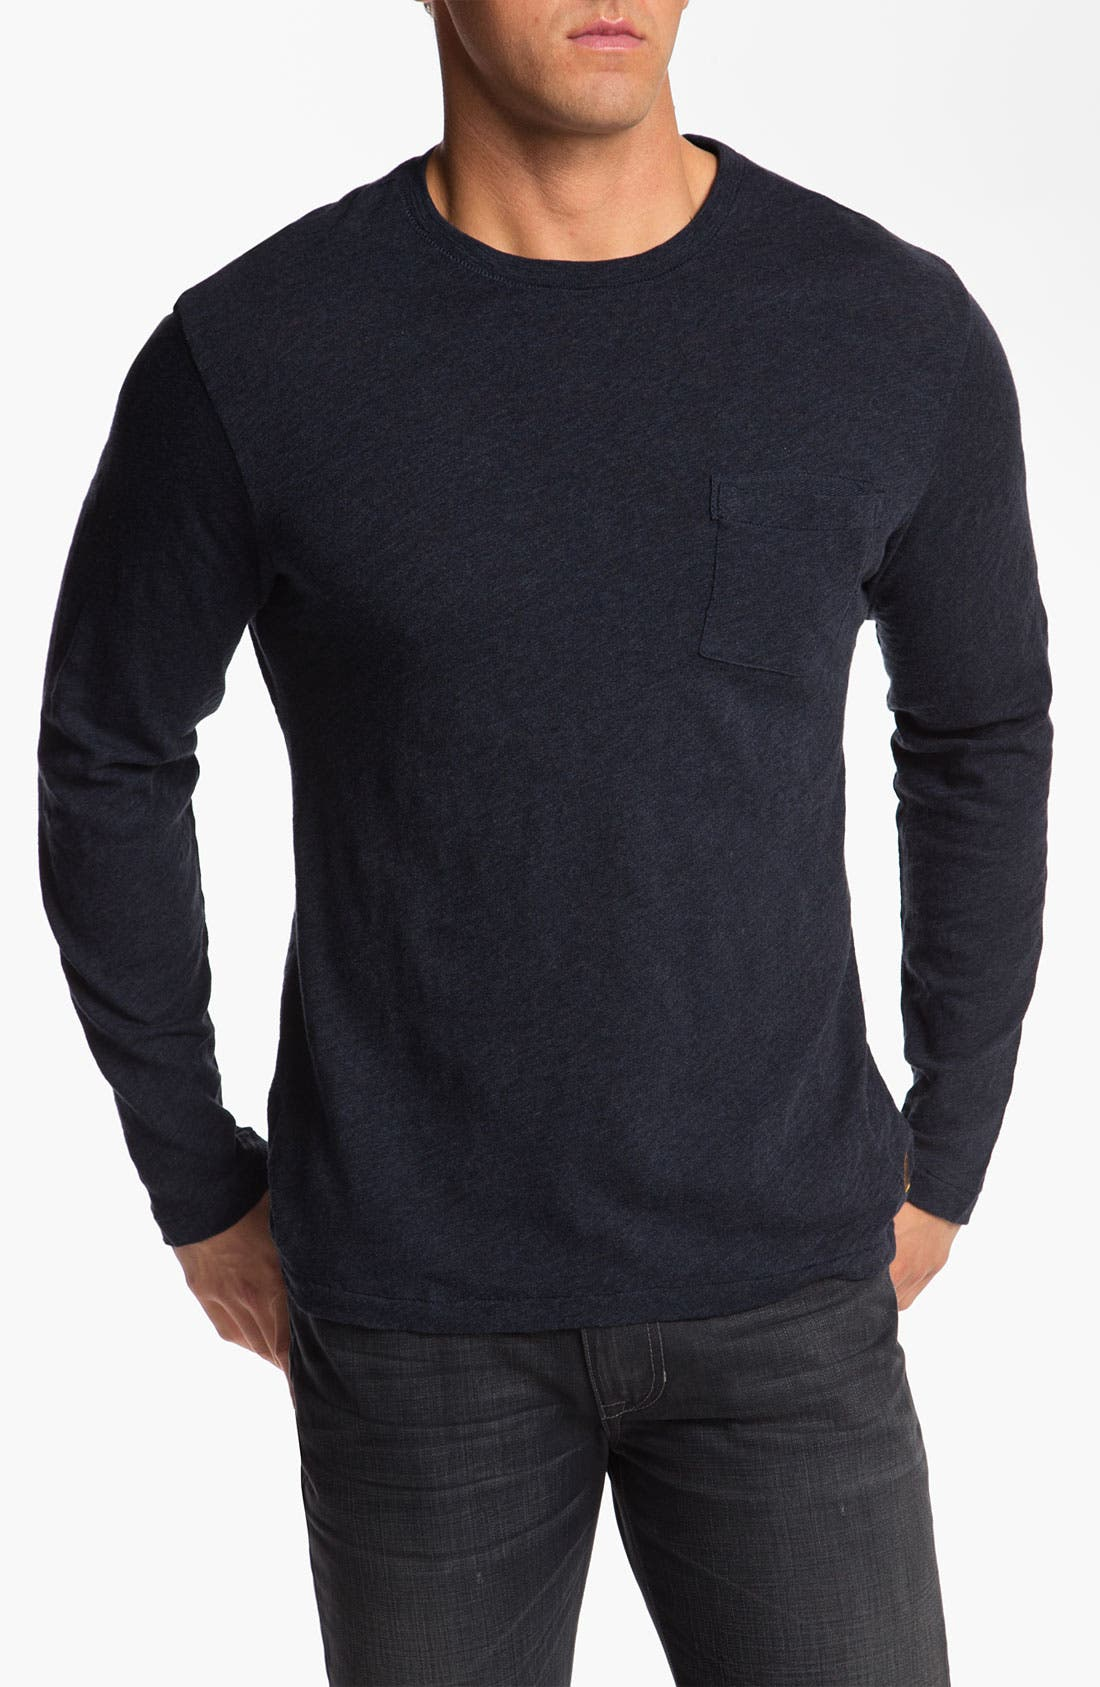 Alternate Image 1 Selected - Volcom 'Albury' Long Sleeve T-Shirt